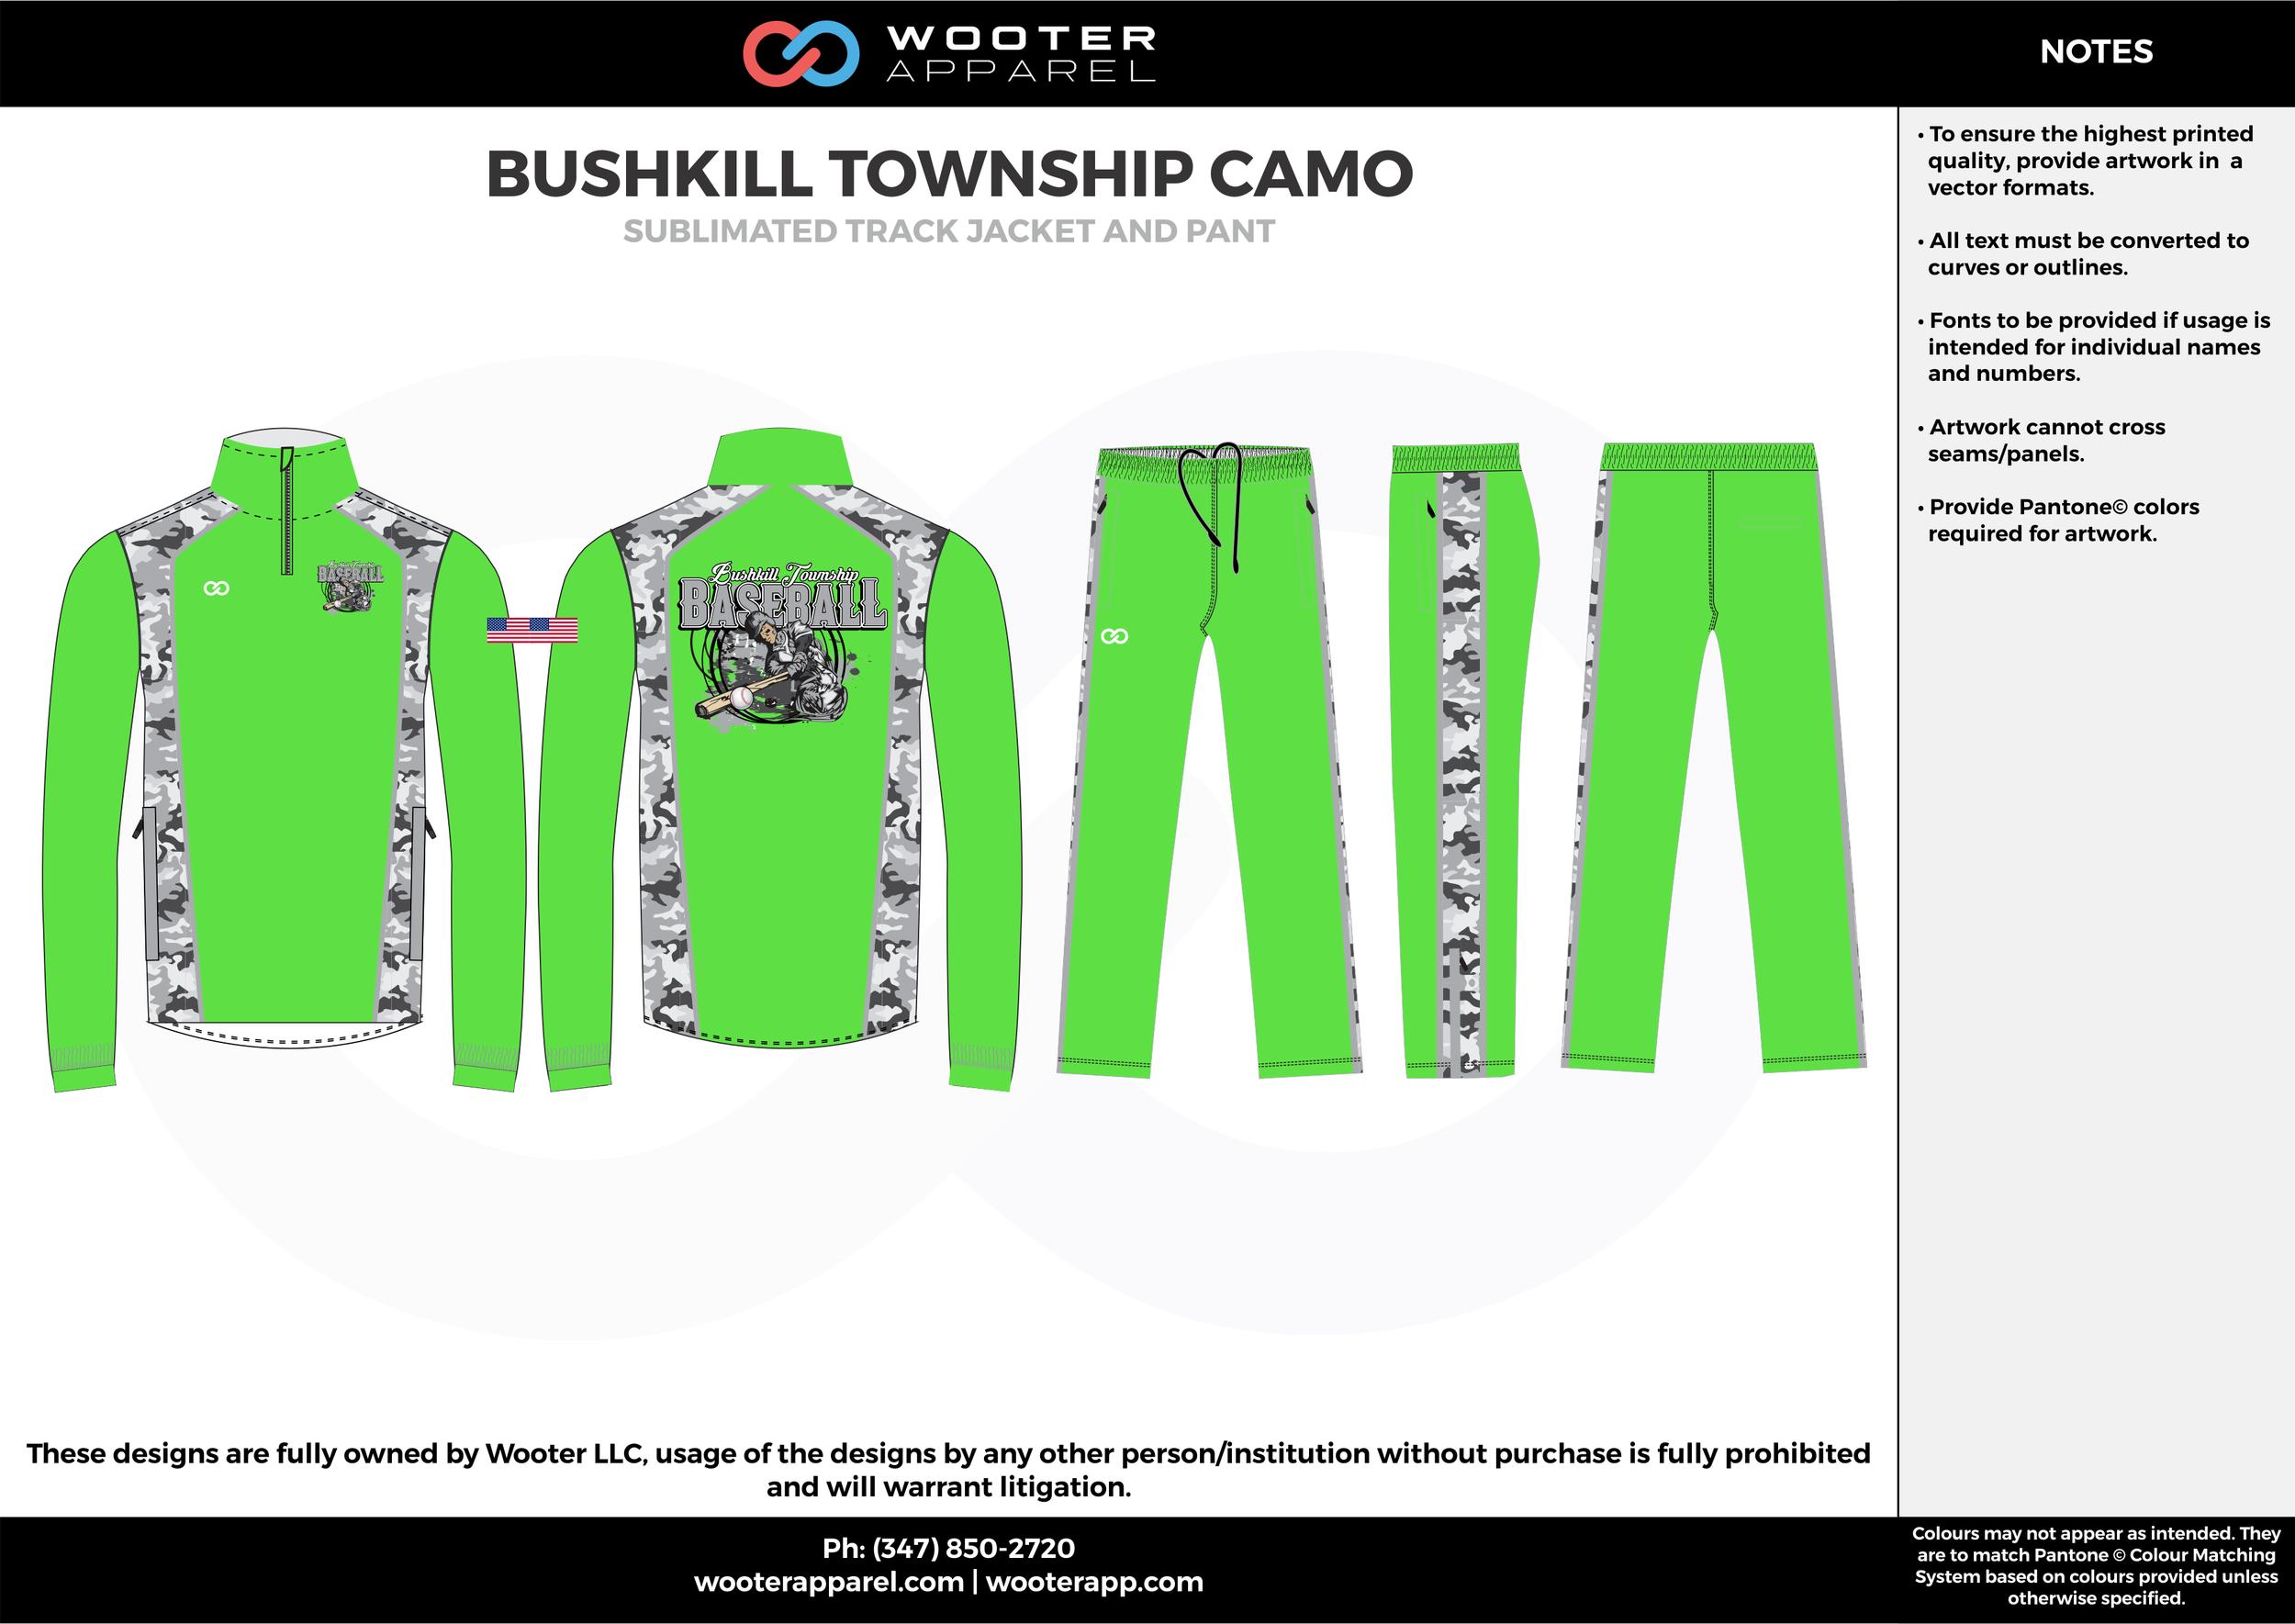 BUSHKILL TOWNSHIP CAMO green gray white  Track Jacket, Track Pants, Tracksuit, Warmup Suit